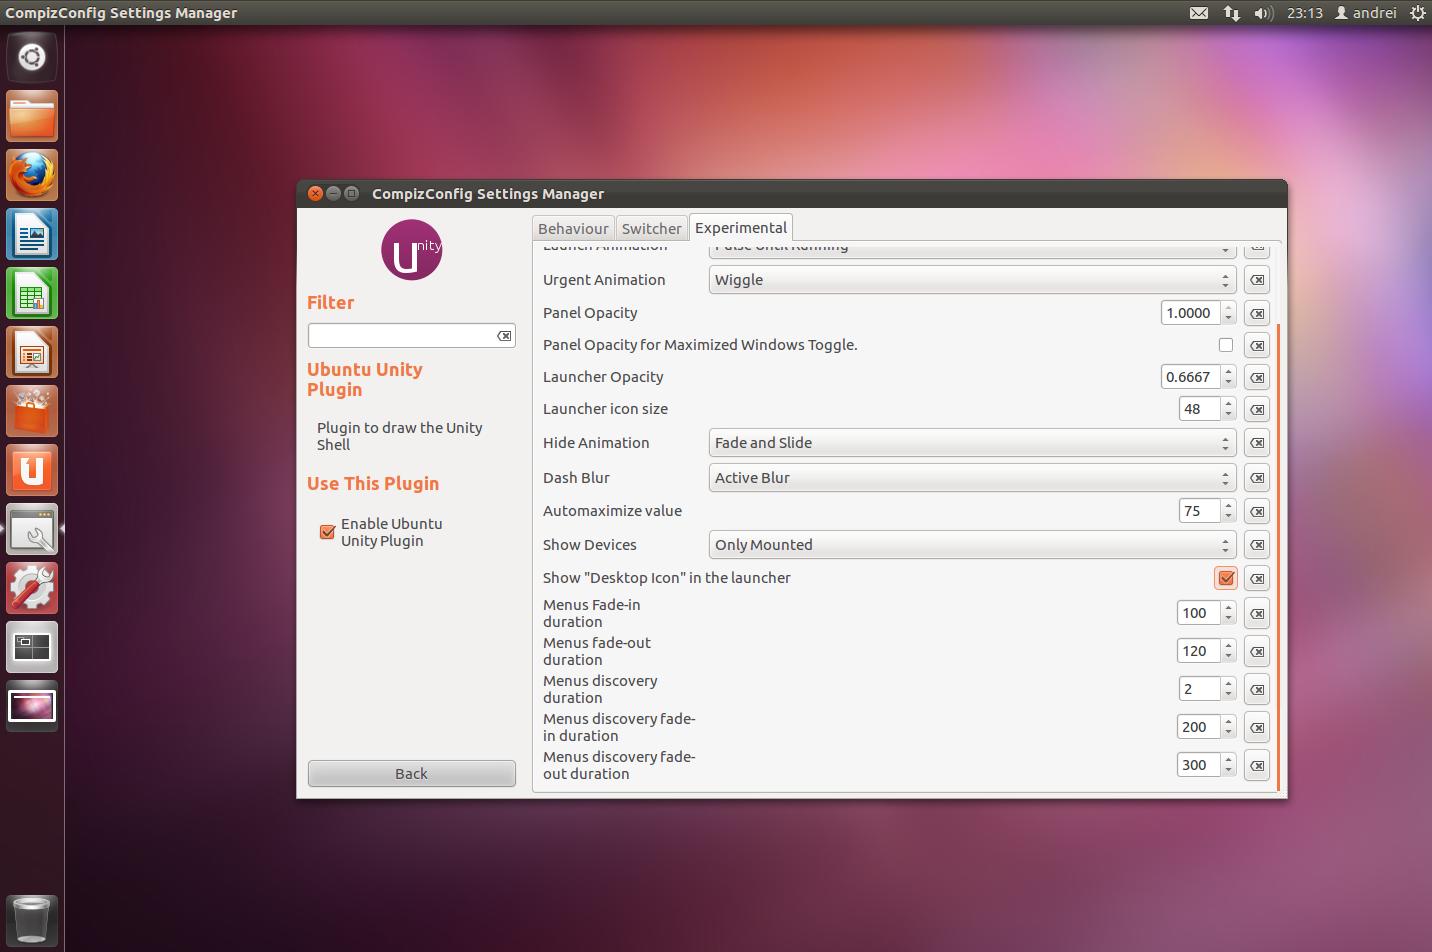 ubuntu12.04-screenshot_5